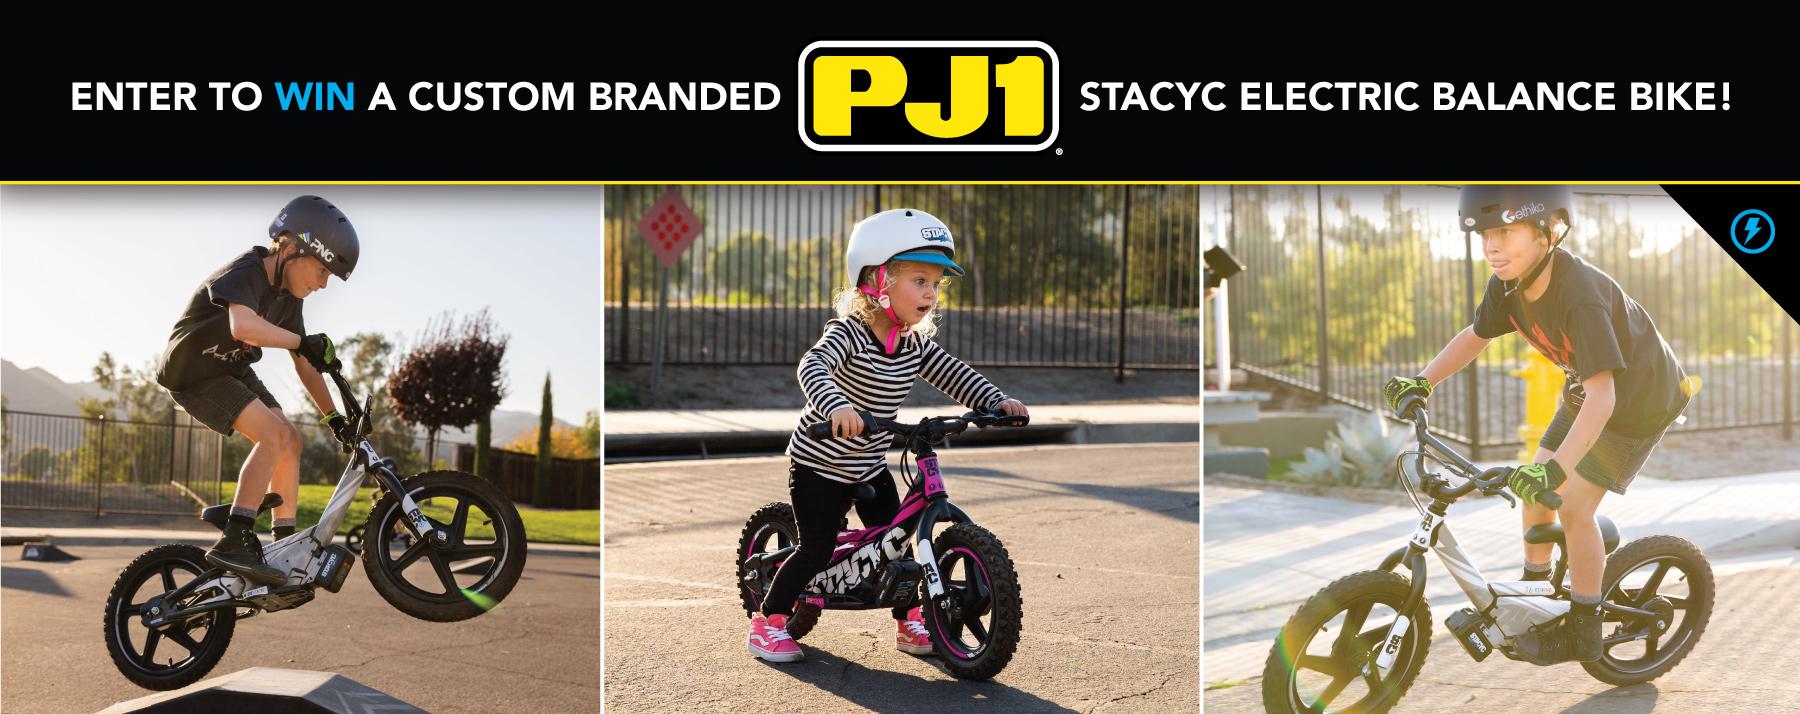 PJ1 | STACYC Giveaway